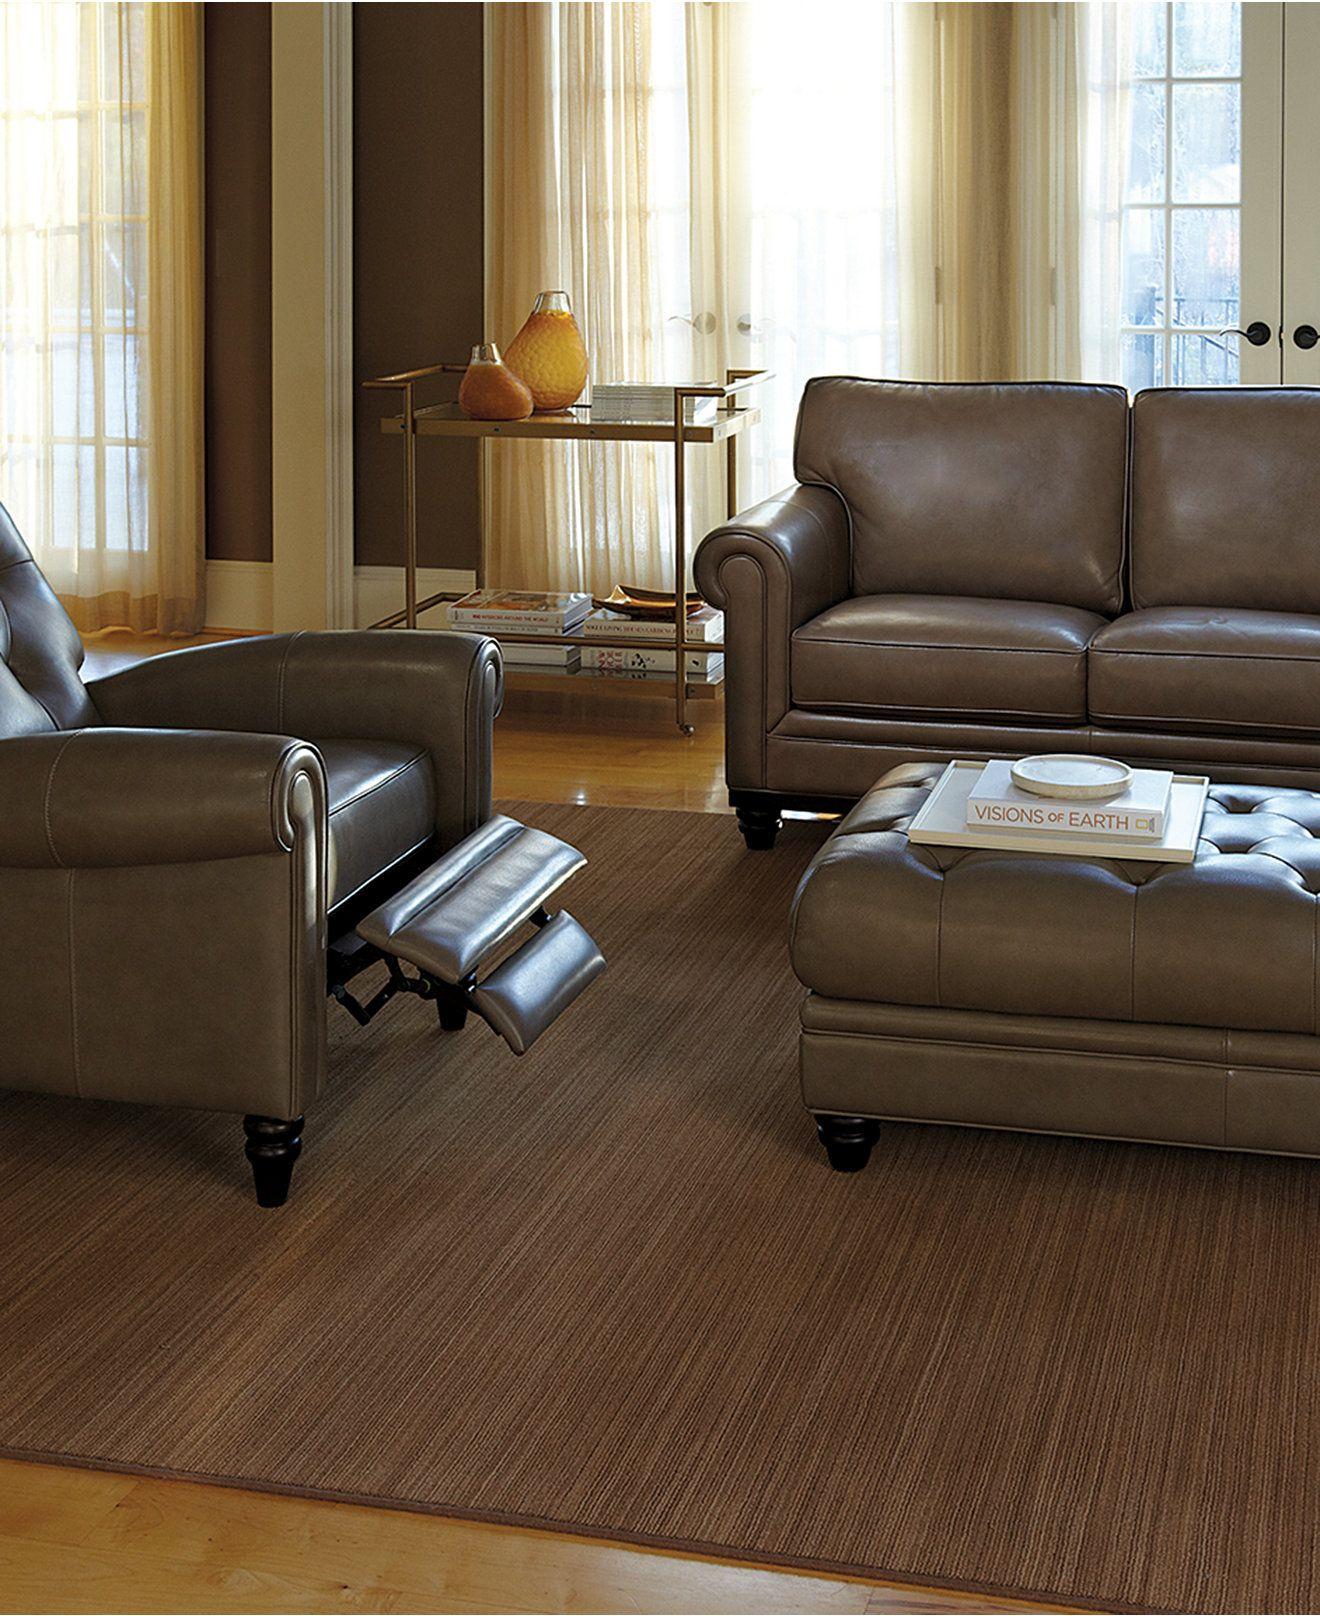 Martha Stewart Bradyn Leather Sofa Living Room Furniture Collection   Shop  All Living Room   Furniture